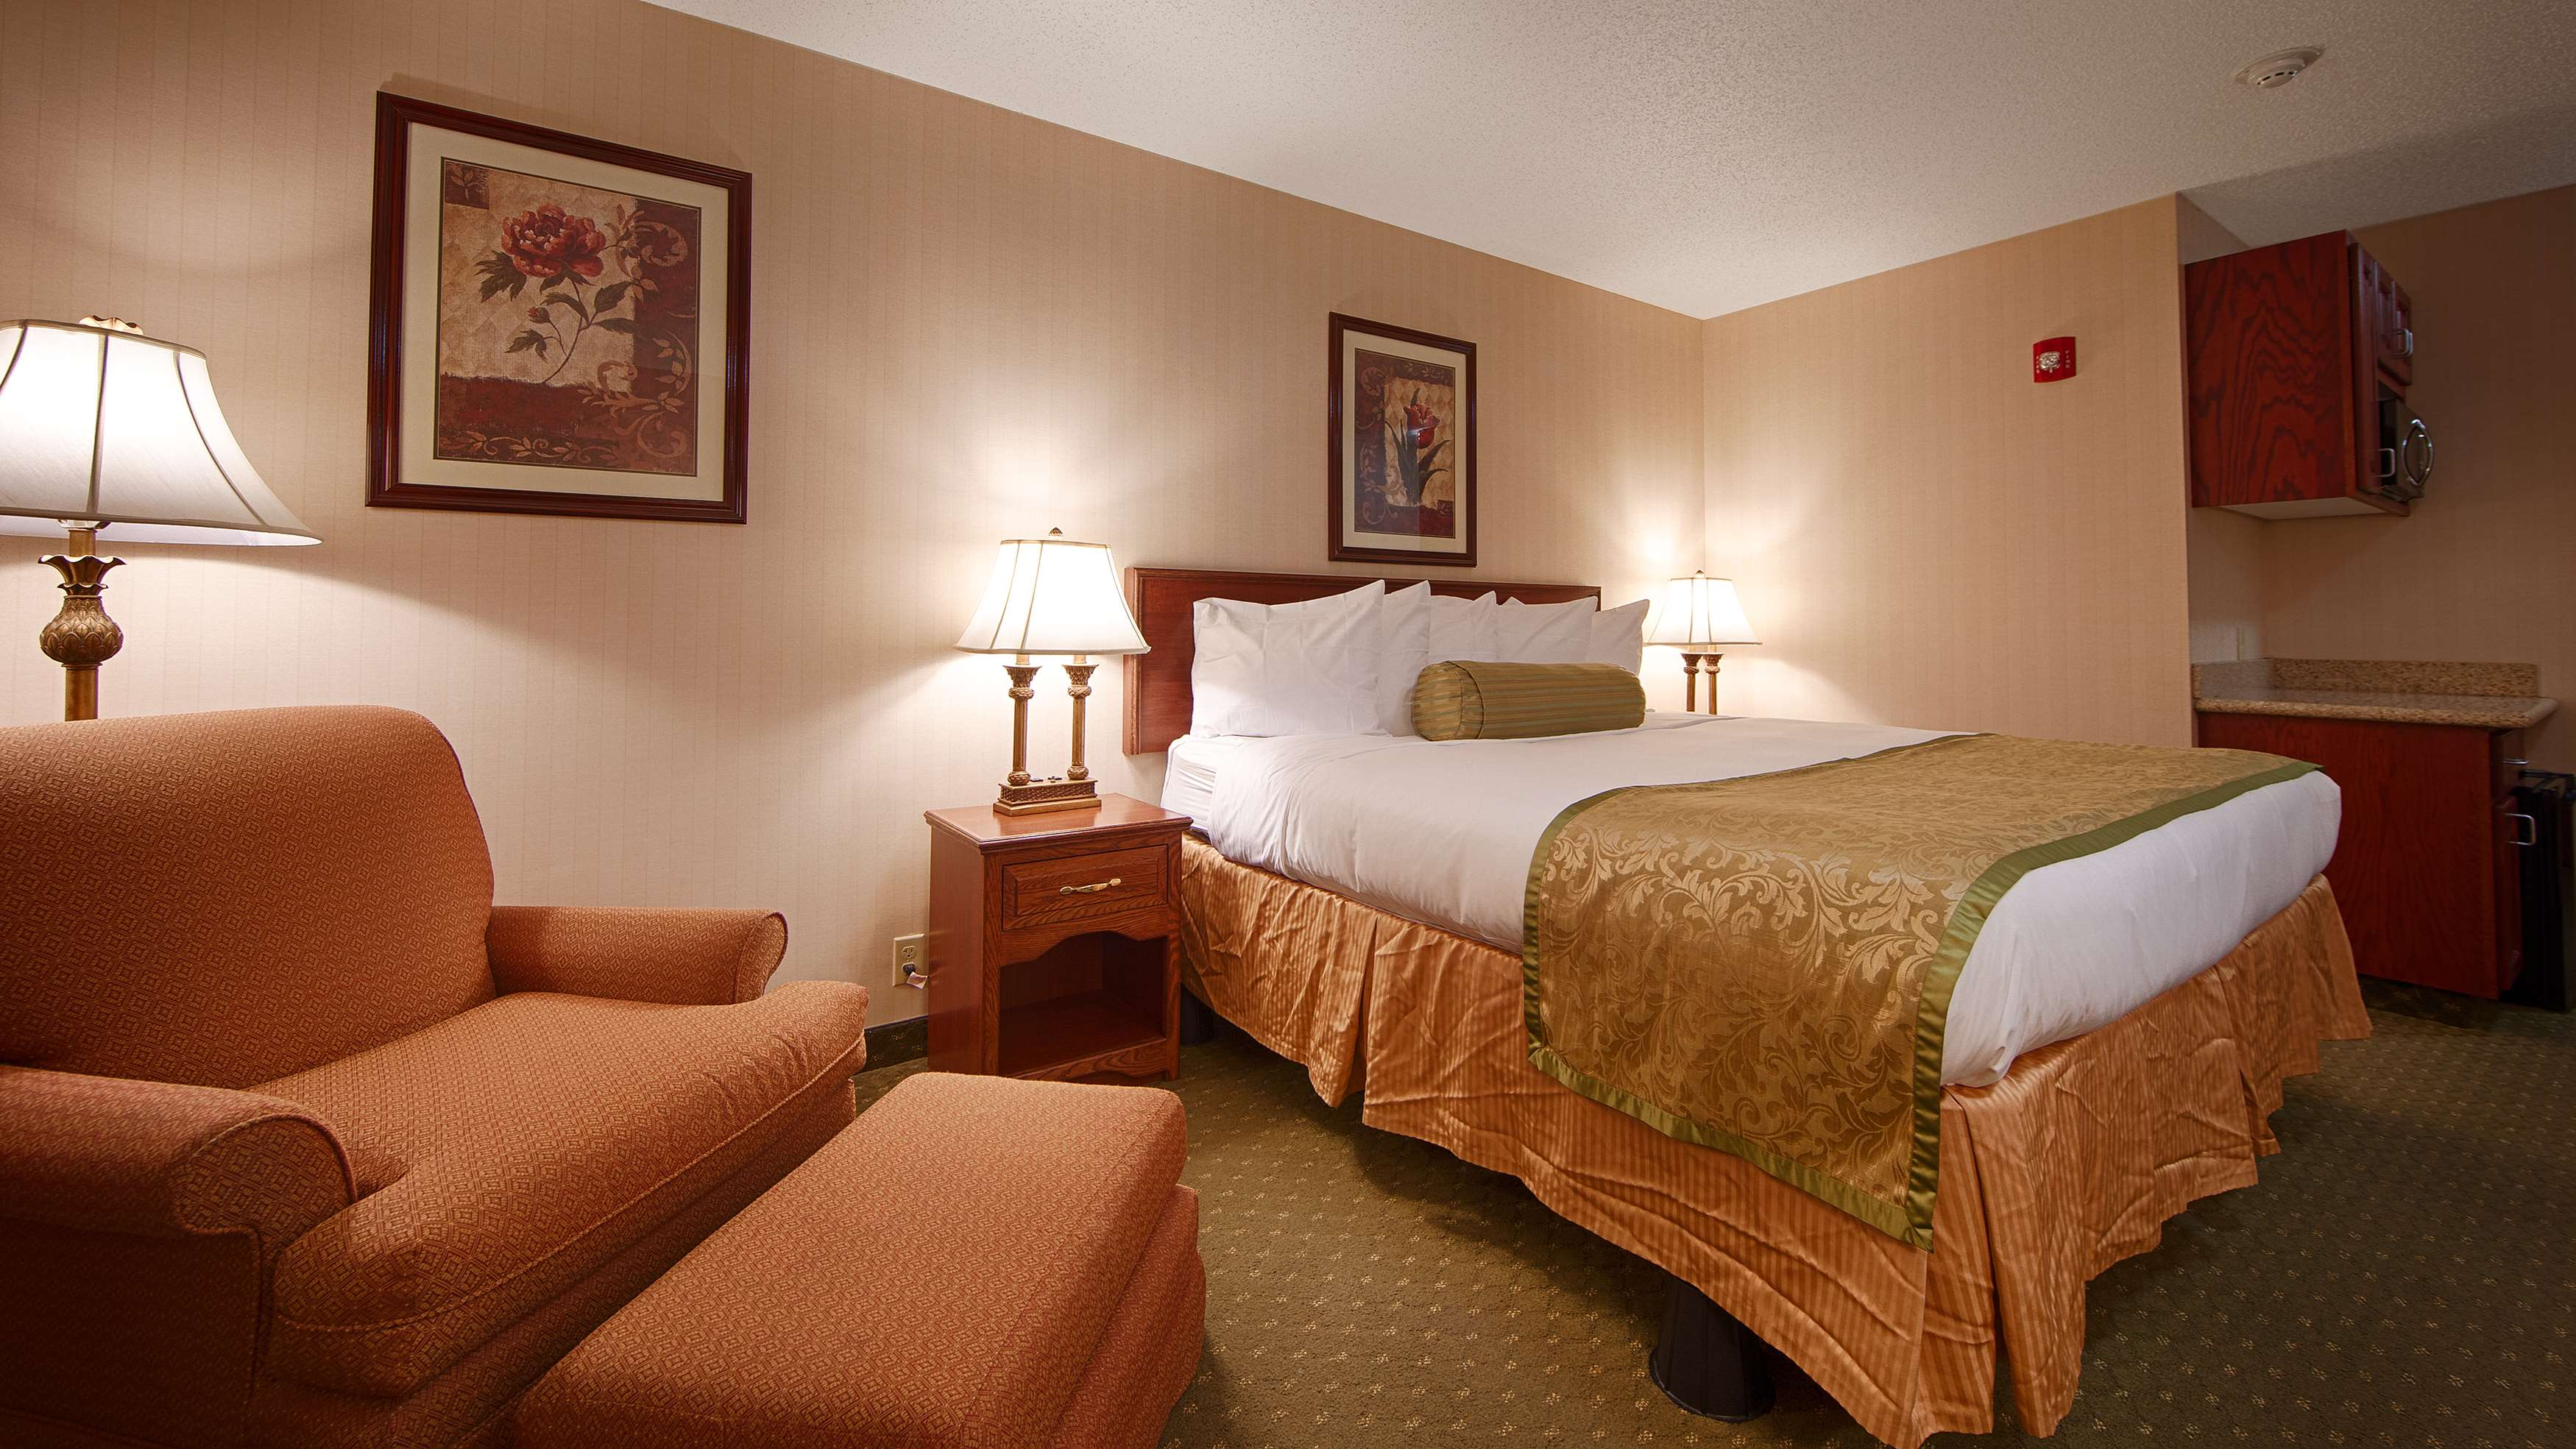 Best Western Providence-Seekonk Inn image 6